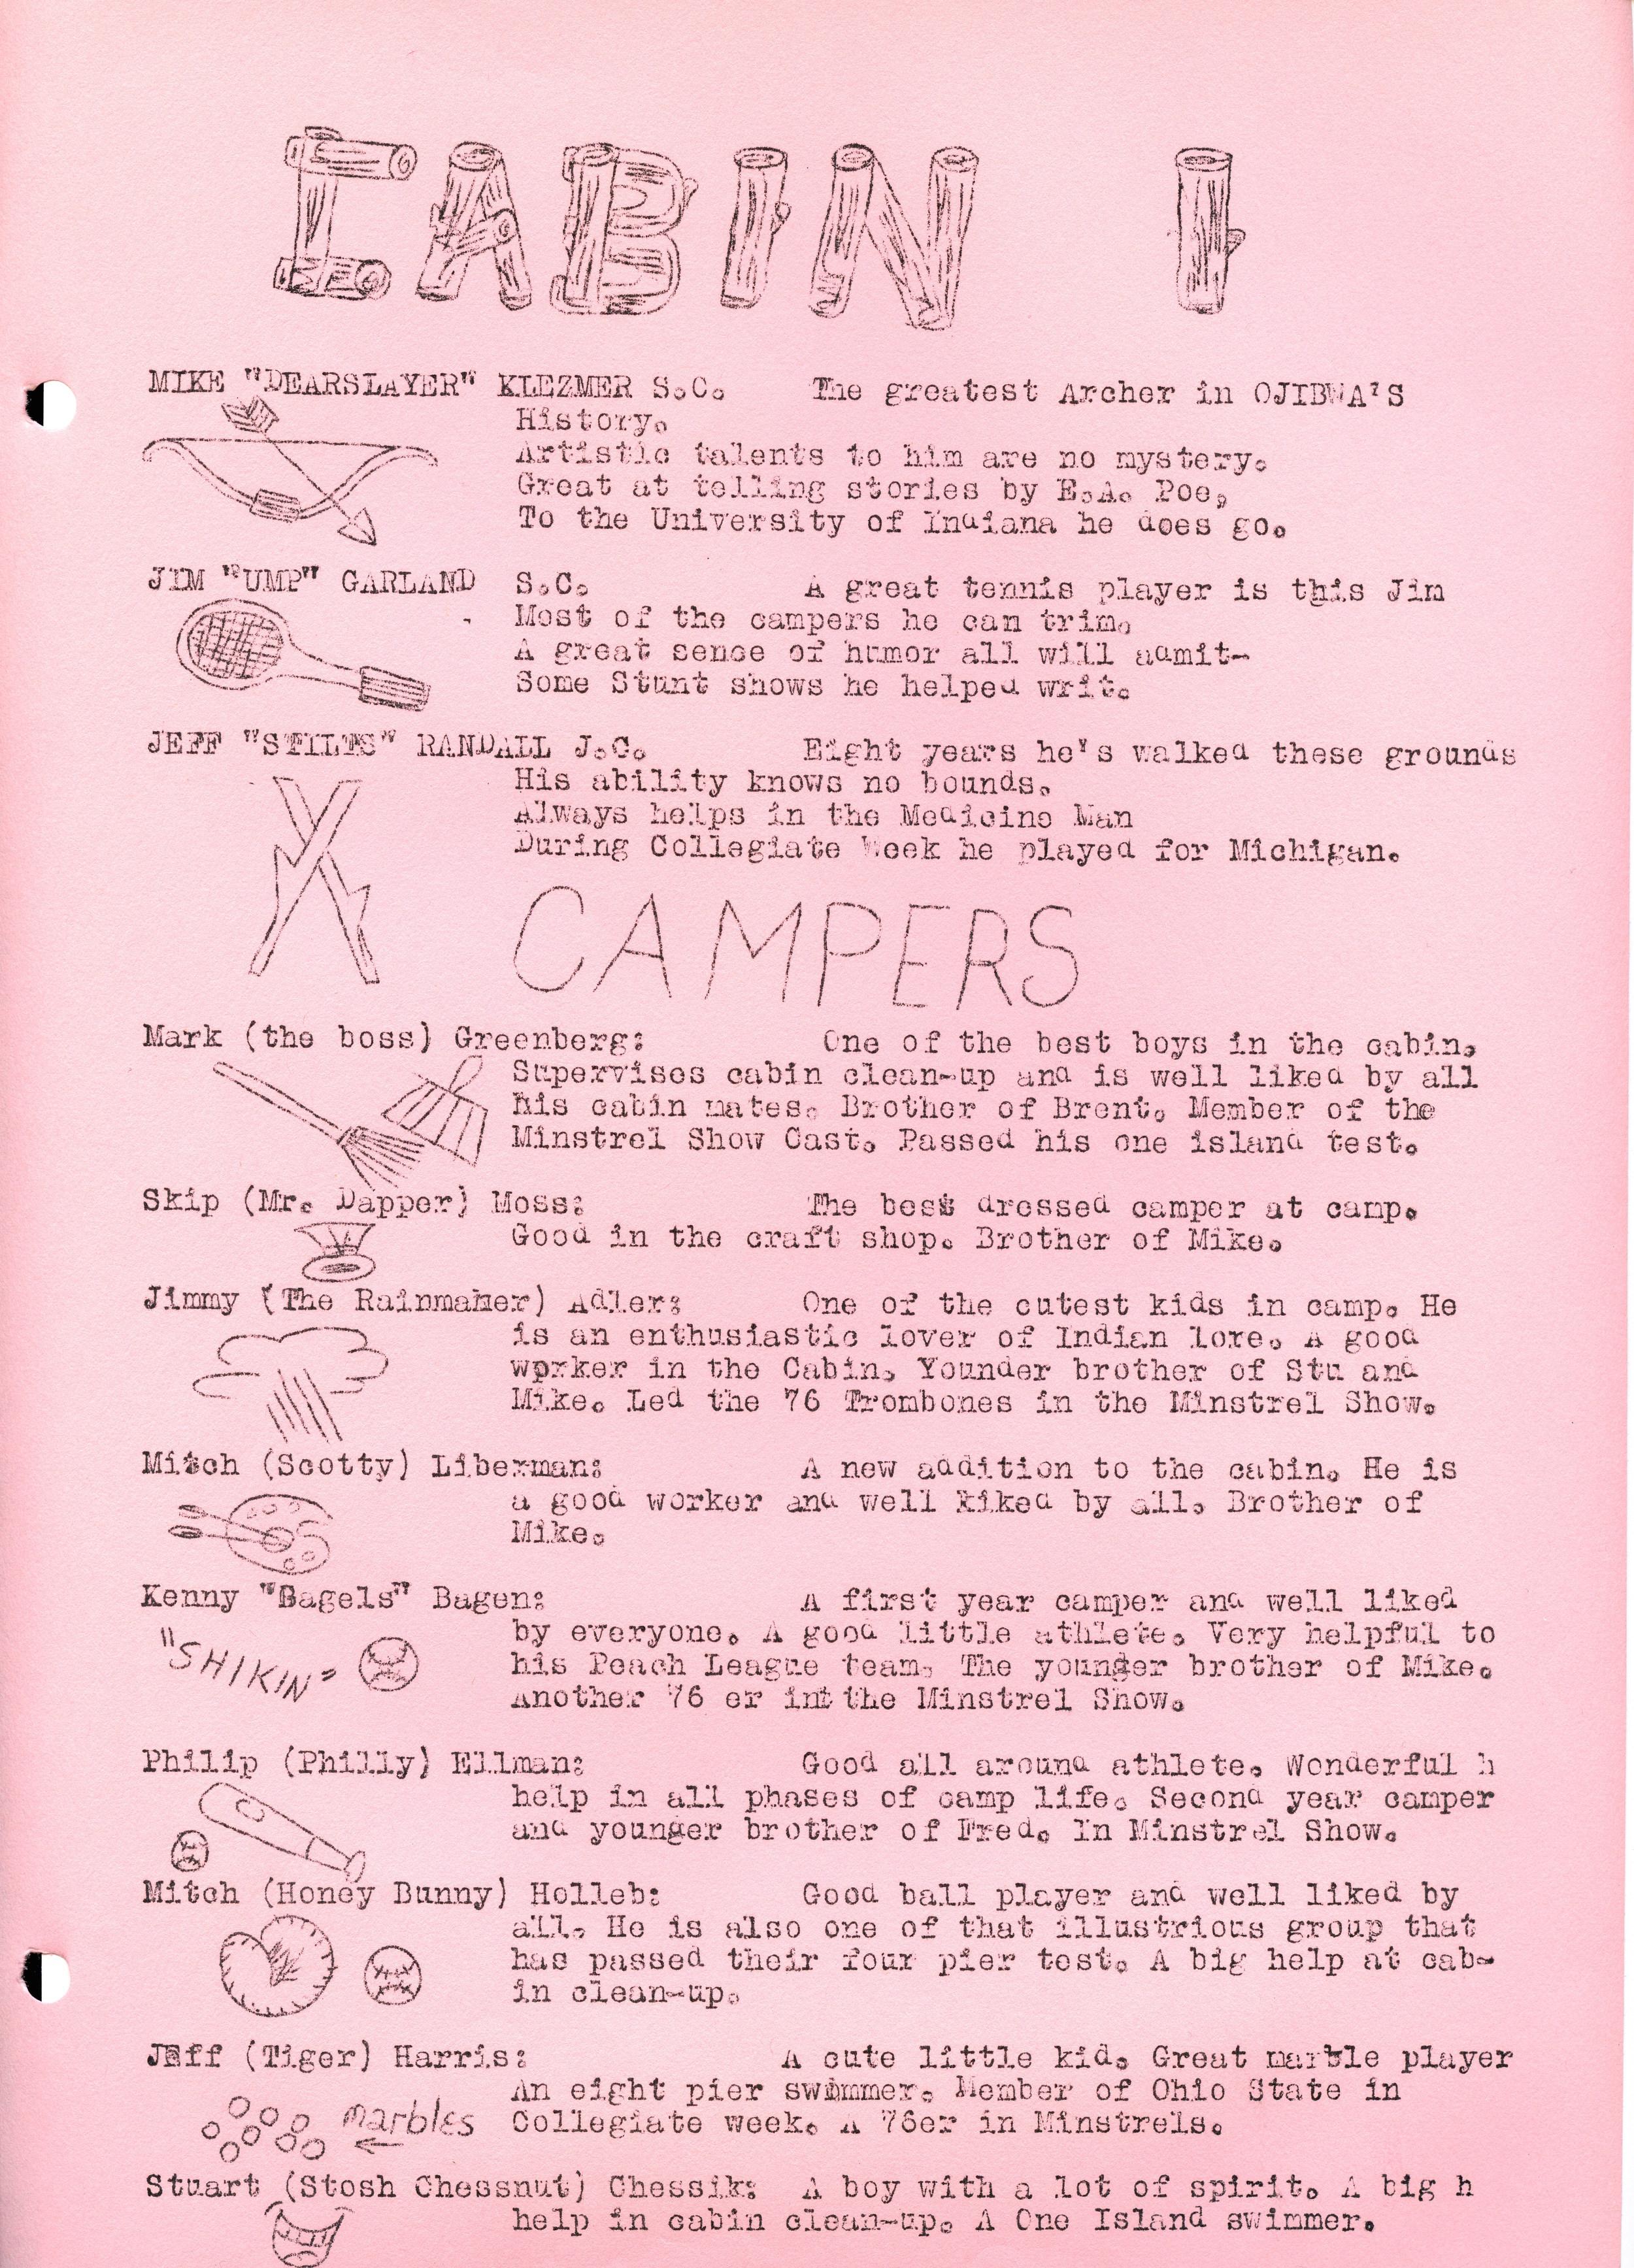 1958 Warrior — Camp Ojibwa History Project